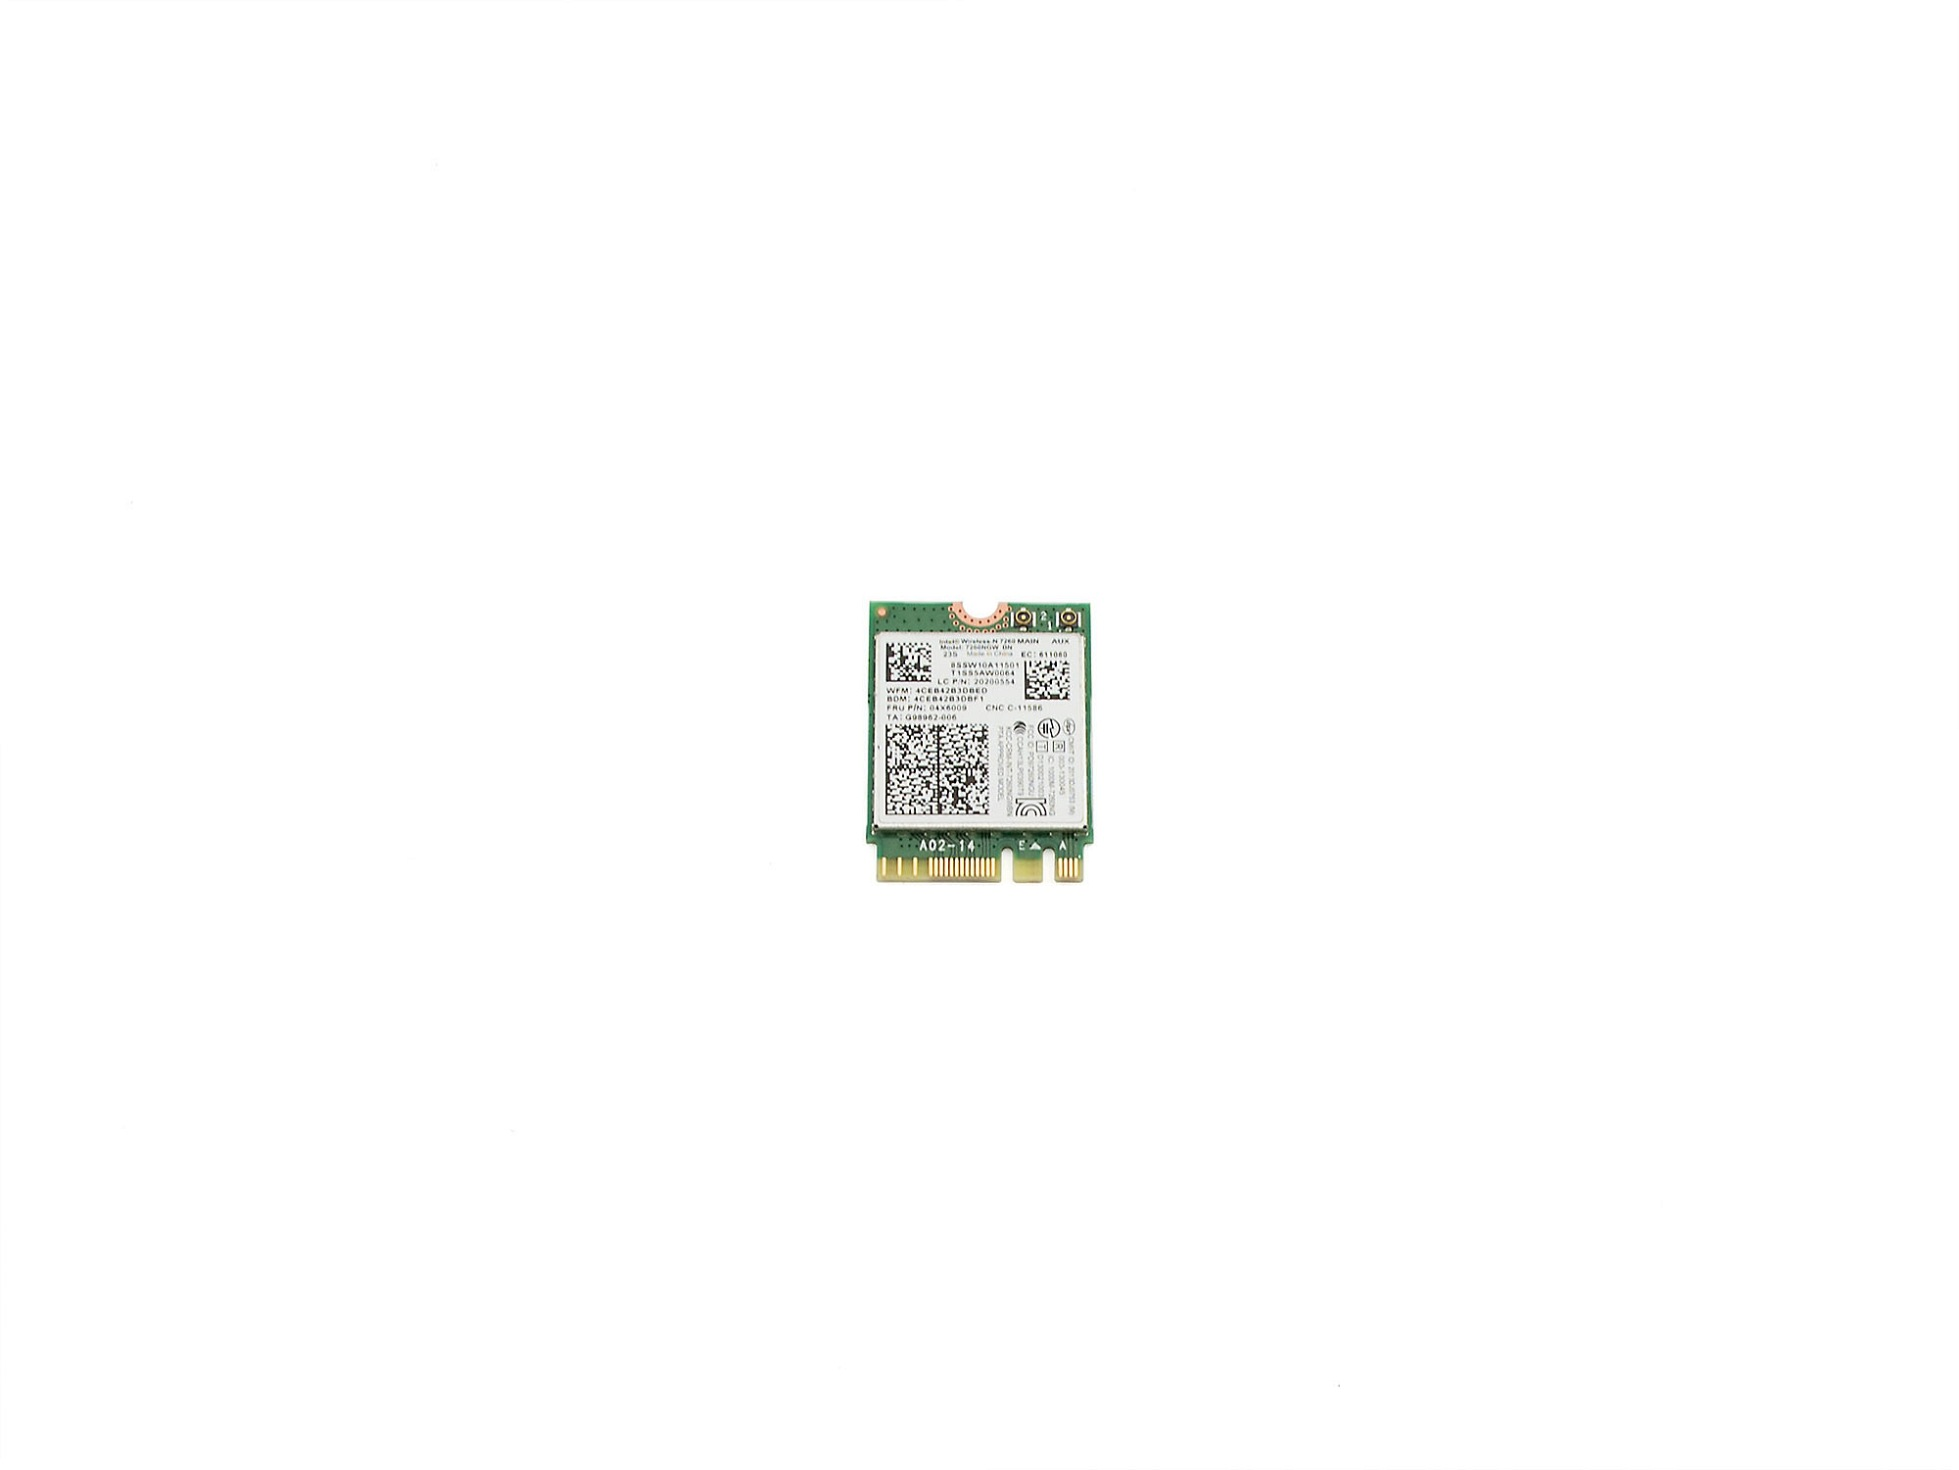 Intel Wireless-N 7260 MAIN für Lenovo ThinkPad T440p Serie